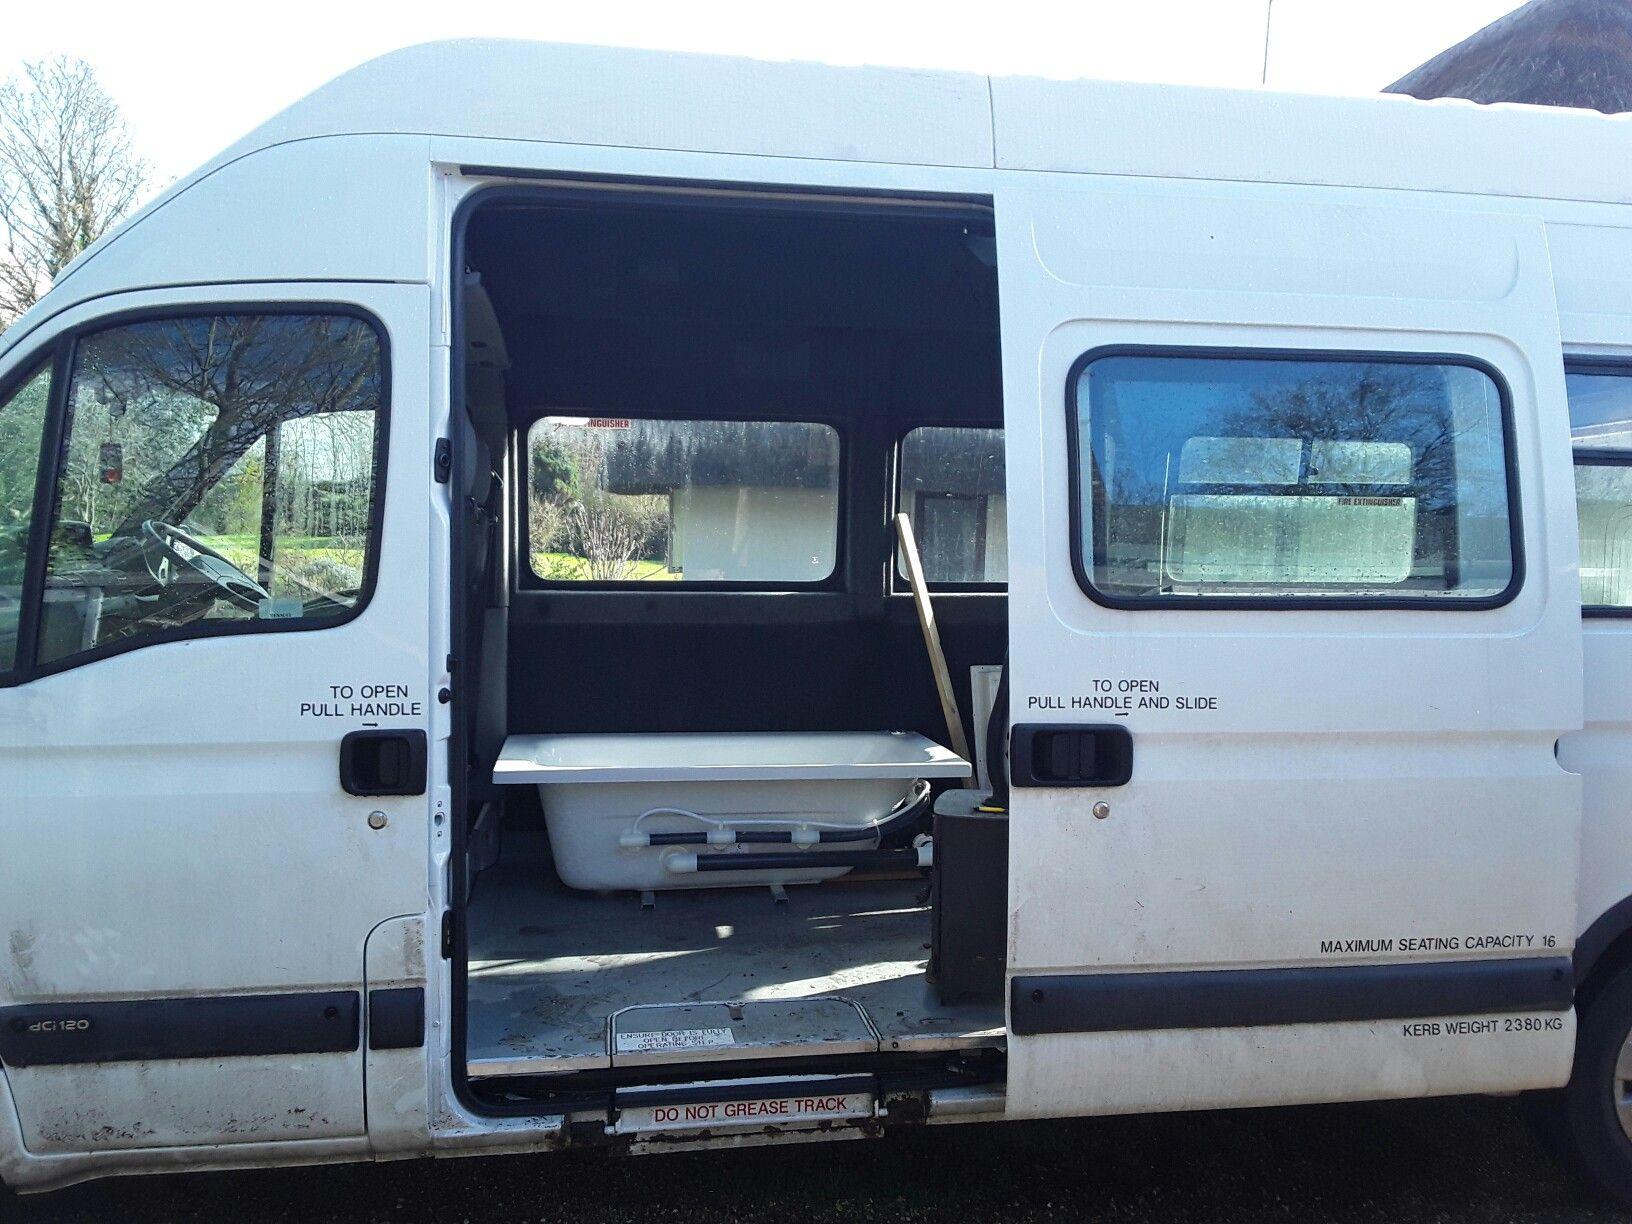 Hot Tub Jacuzzi Inside A Campervan Recreational Vehicles Campervan Hot Tub